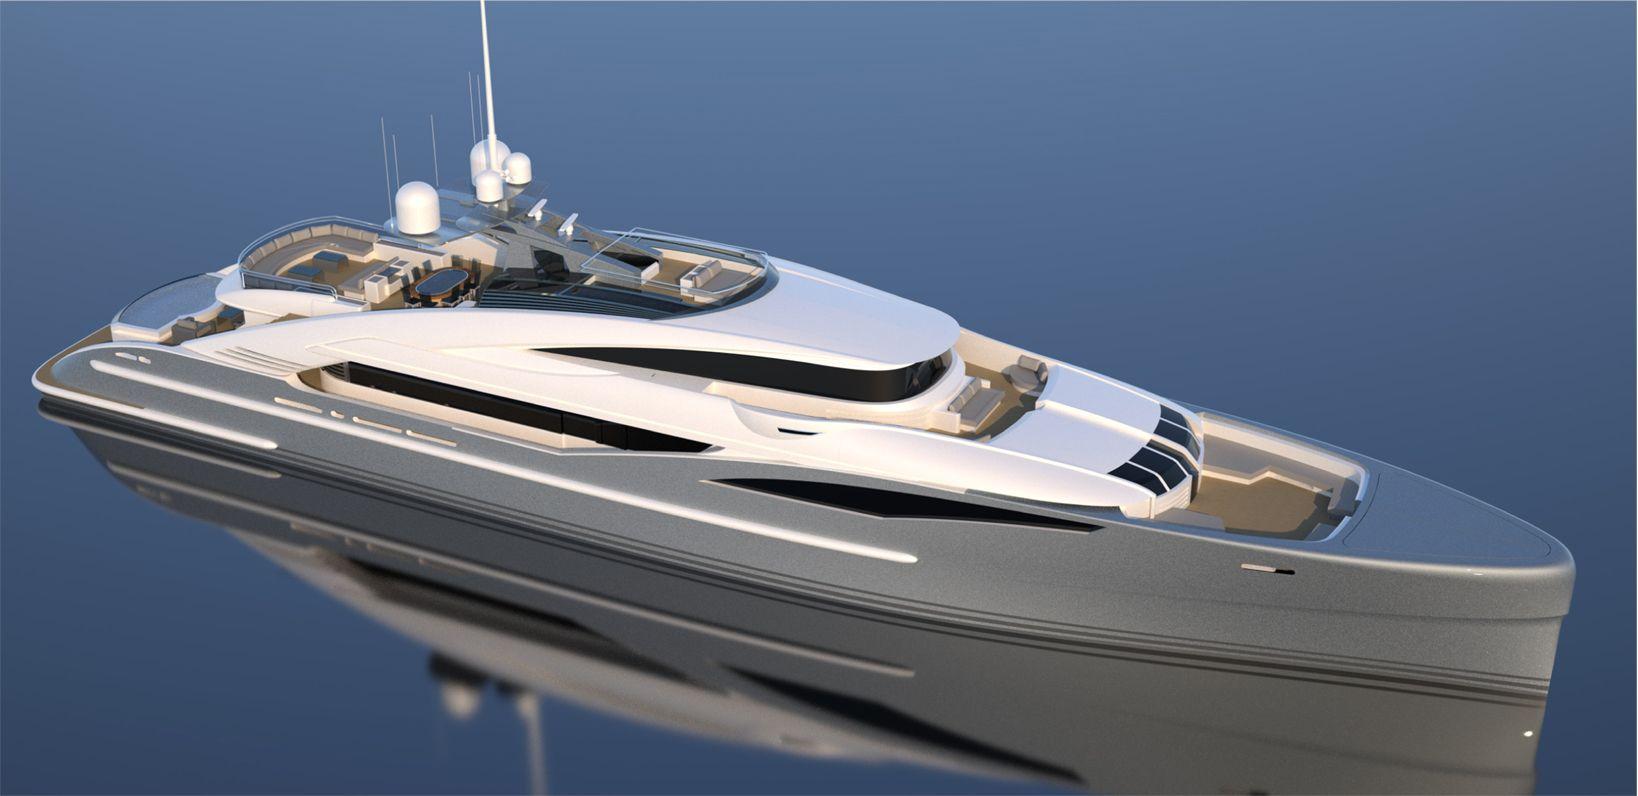 50 meter yacht for sale granturismo isa yachts yachts 40 50 meters pinterest. Black Bedroom Furniture Sets. Home Design Ideas